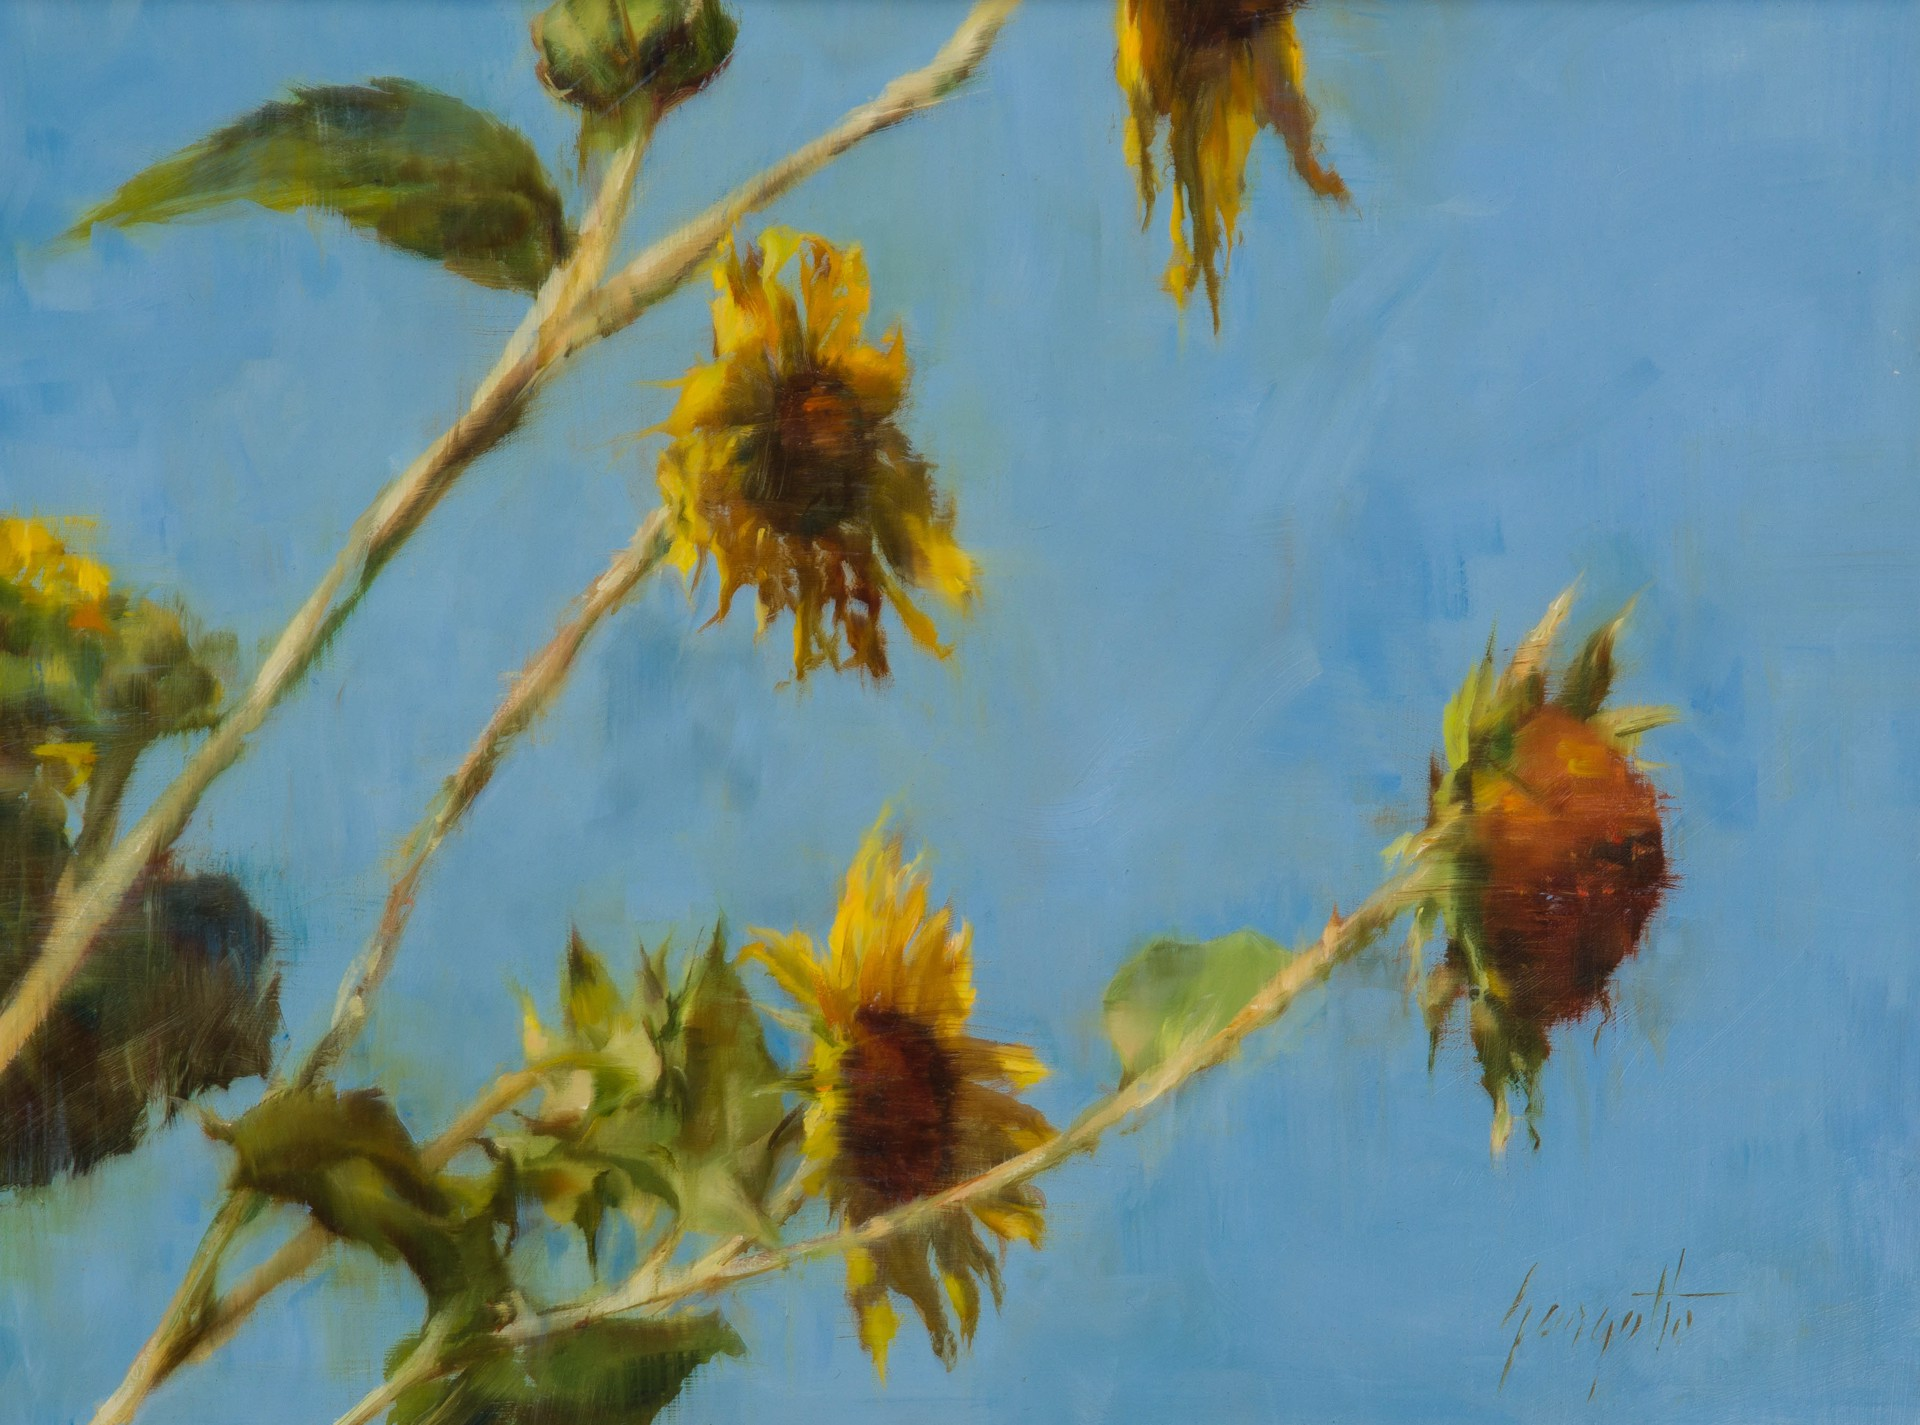 In the Breeze #2 by Ann Gargotto